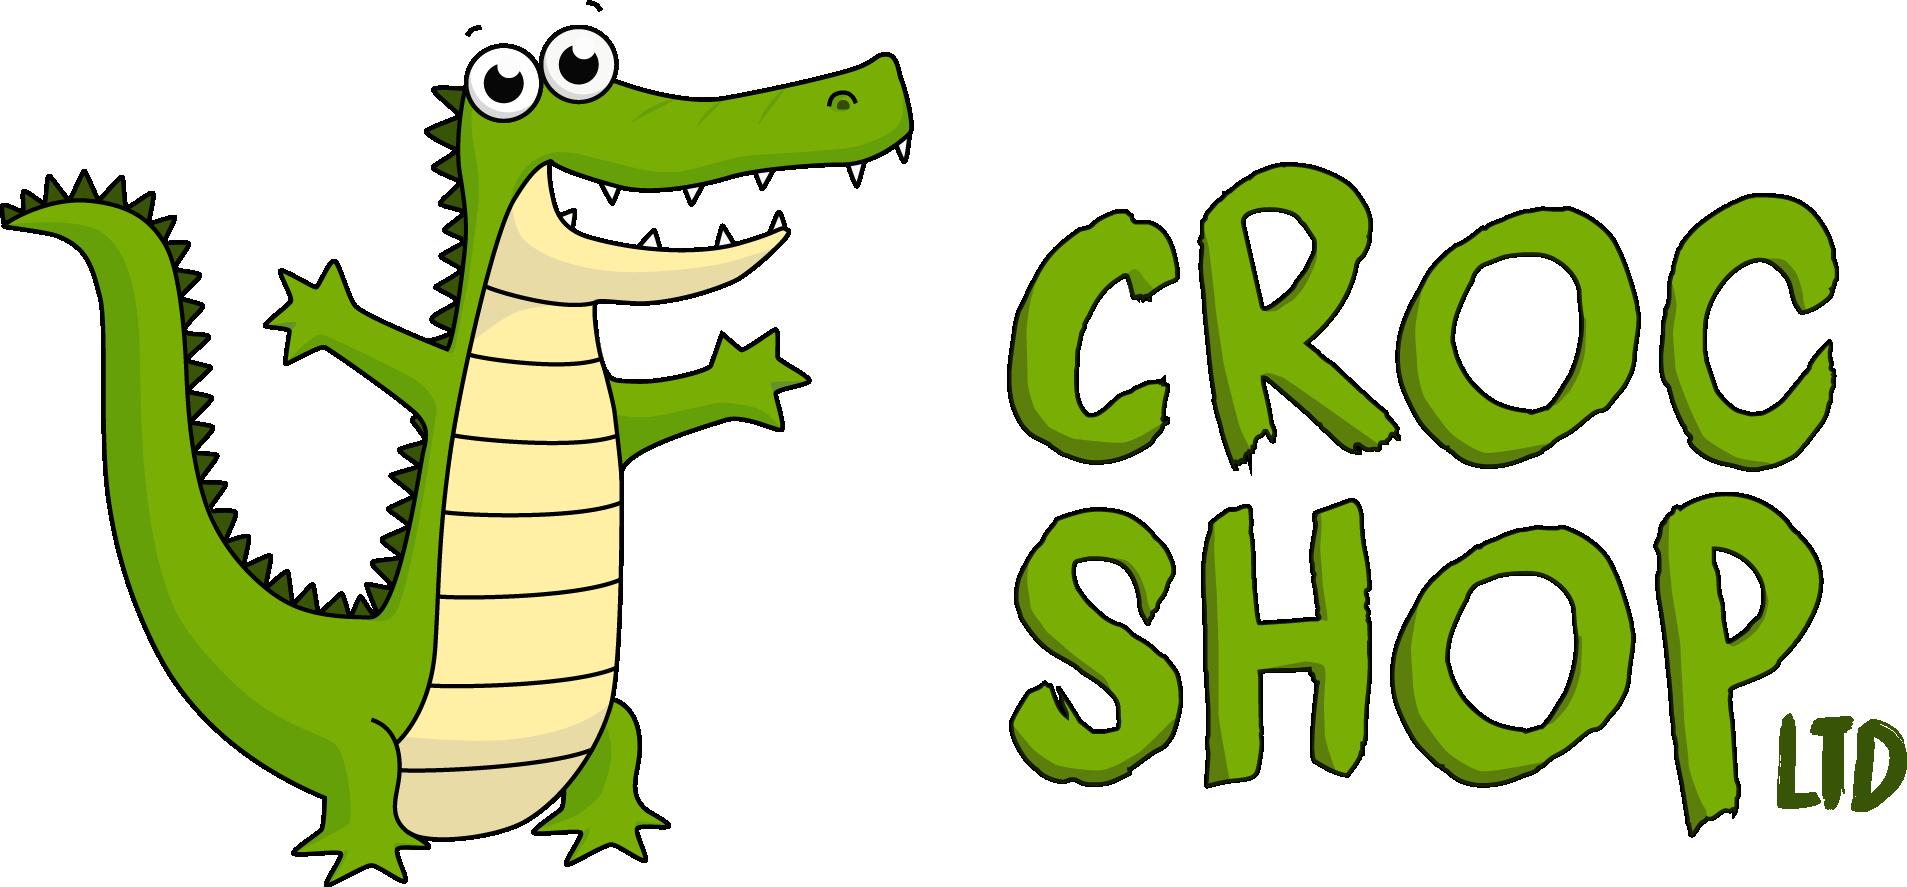 Footprint clipart alligator. Buy crocodiles of the